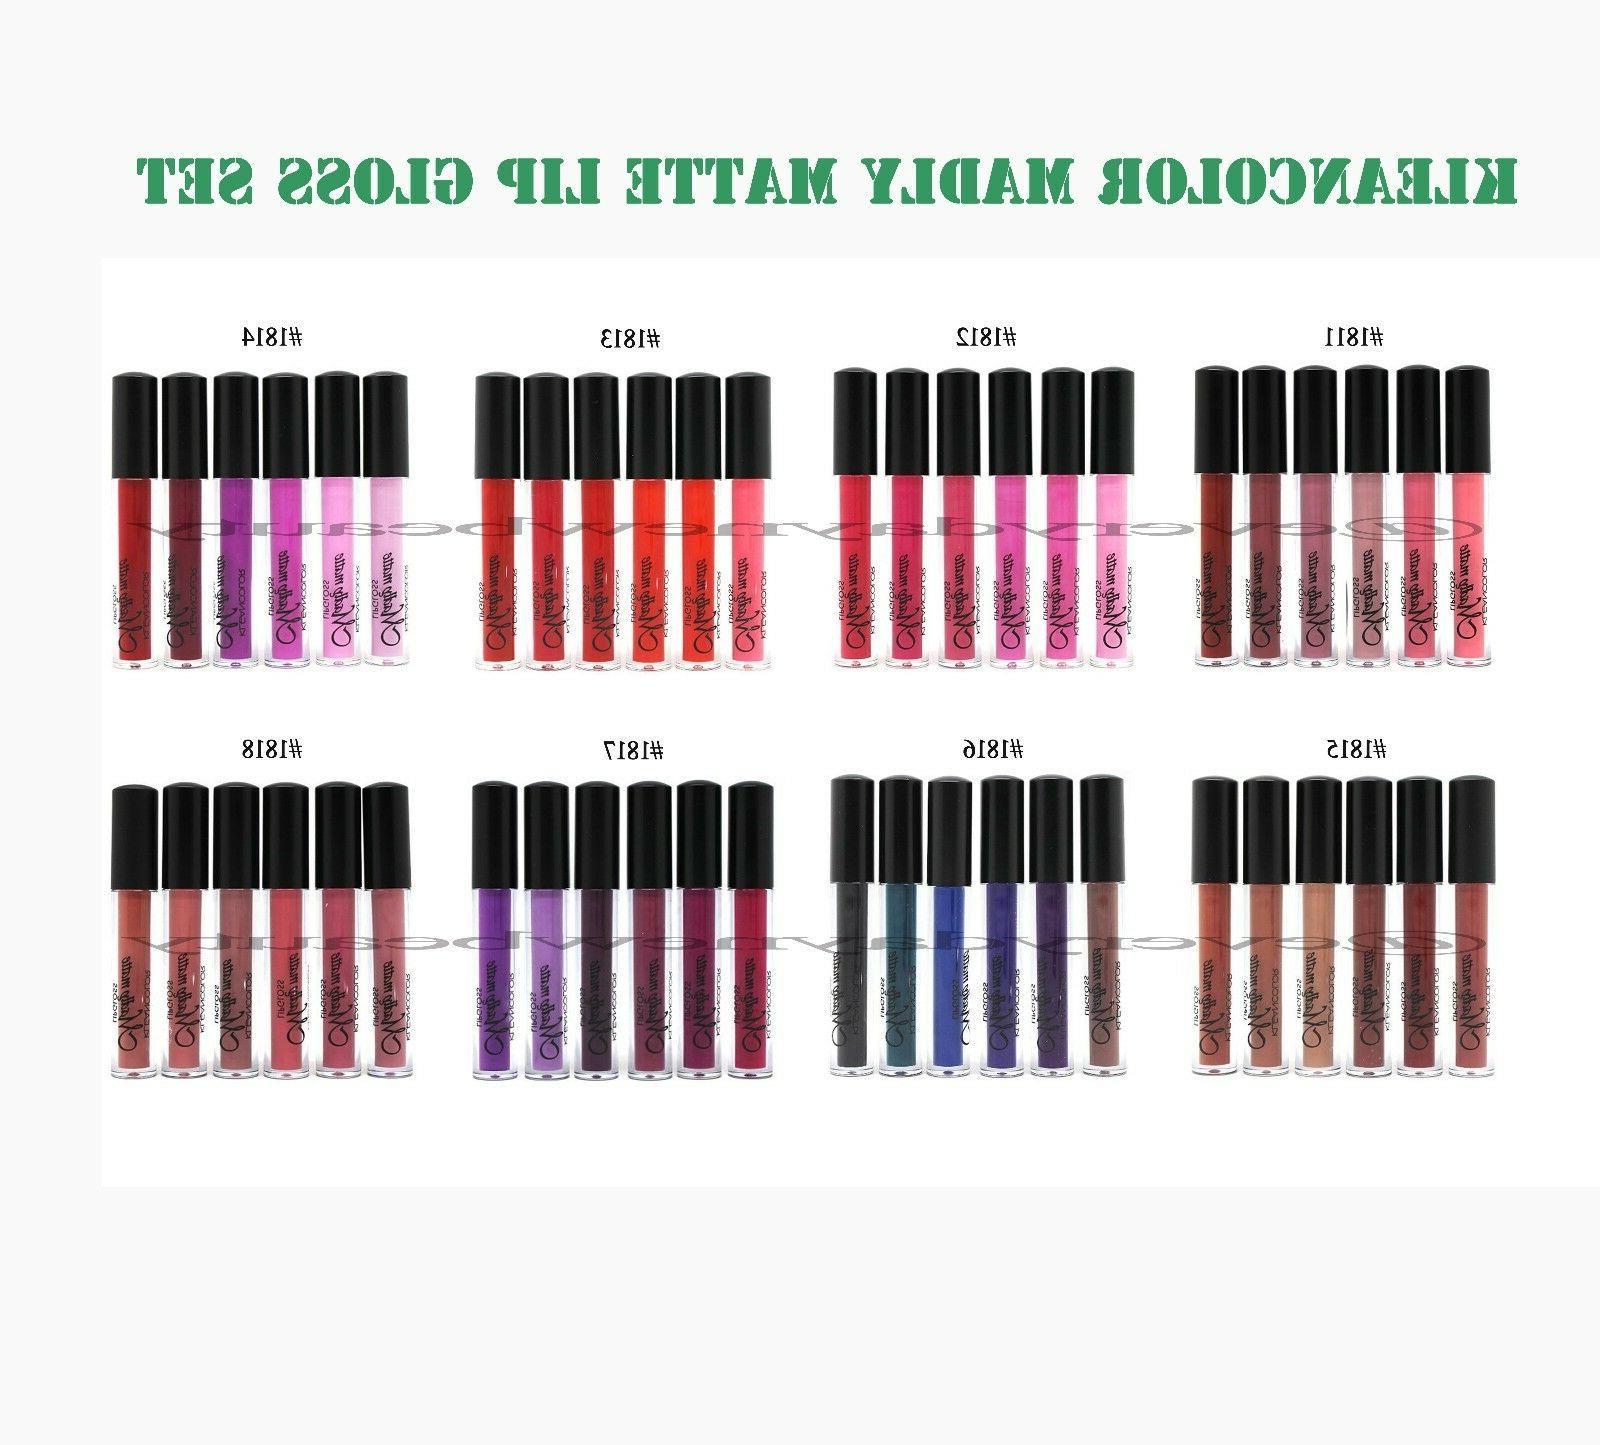 Kleancolor Madly Matte Liquid Lip gloss Lipstick